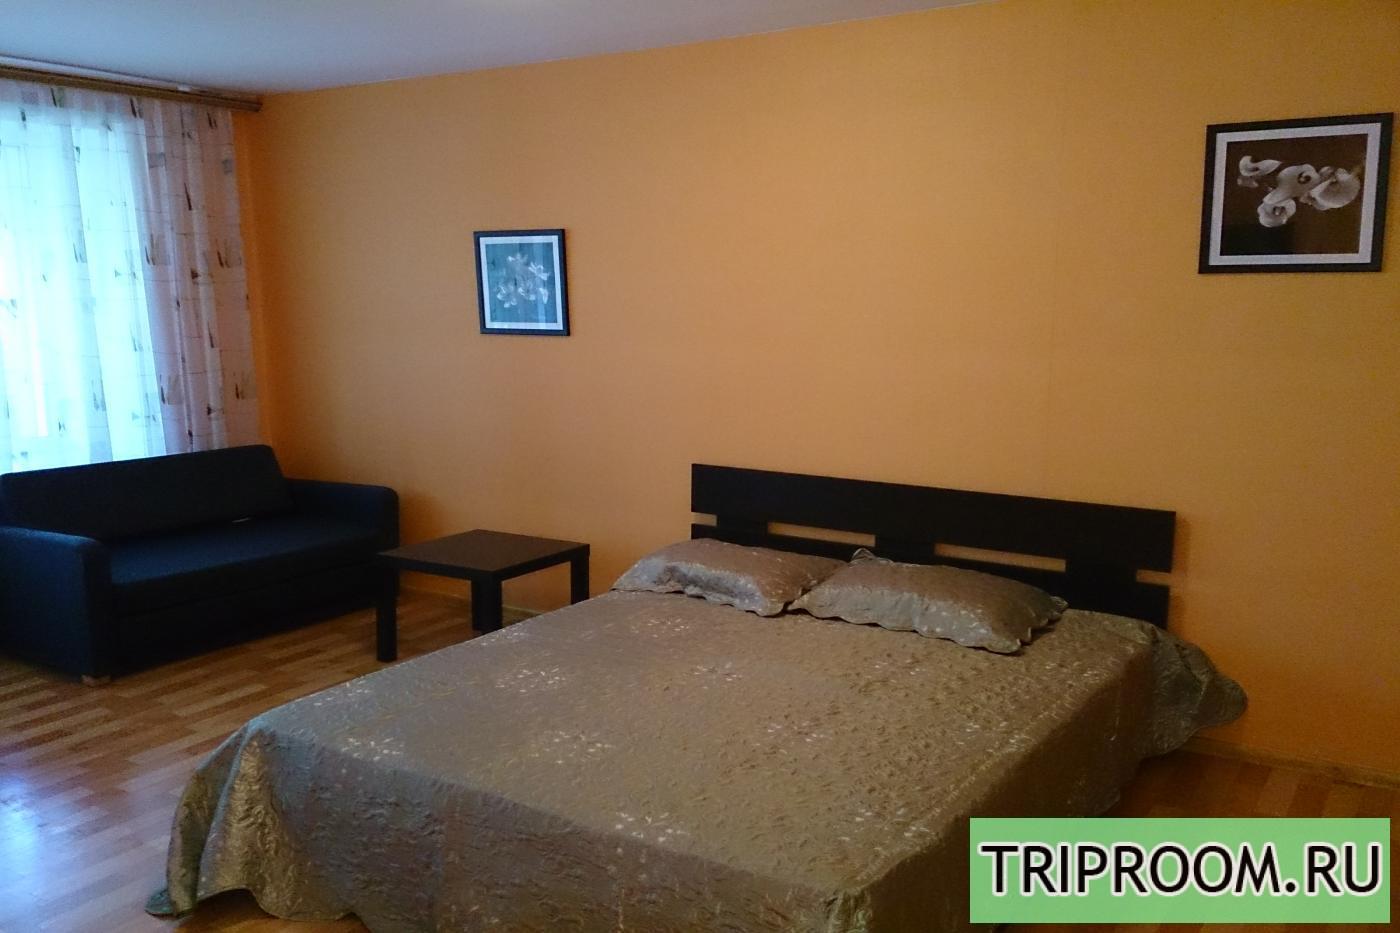 1-комнатная квартира посуточно (вариант № 12826), ул. Челюскинцев улица, фото № 1